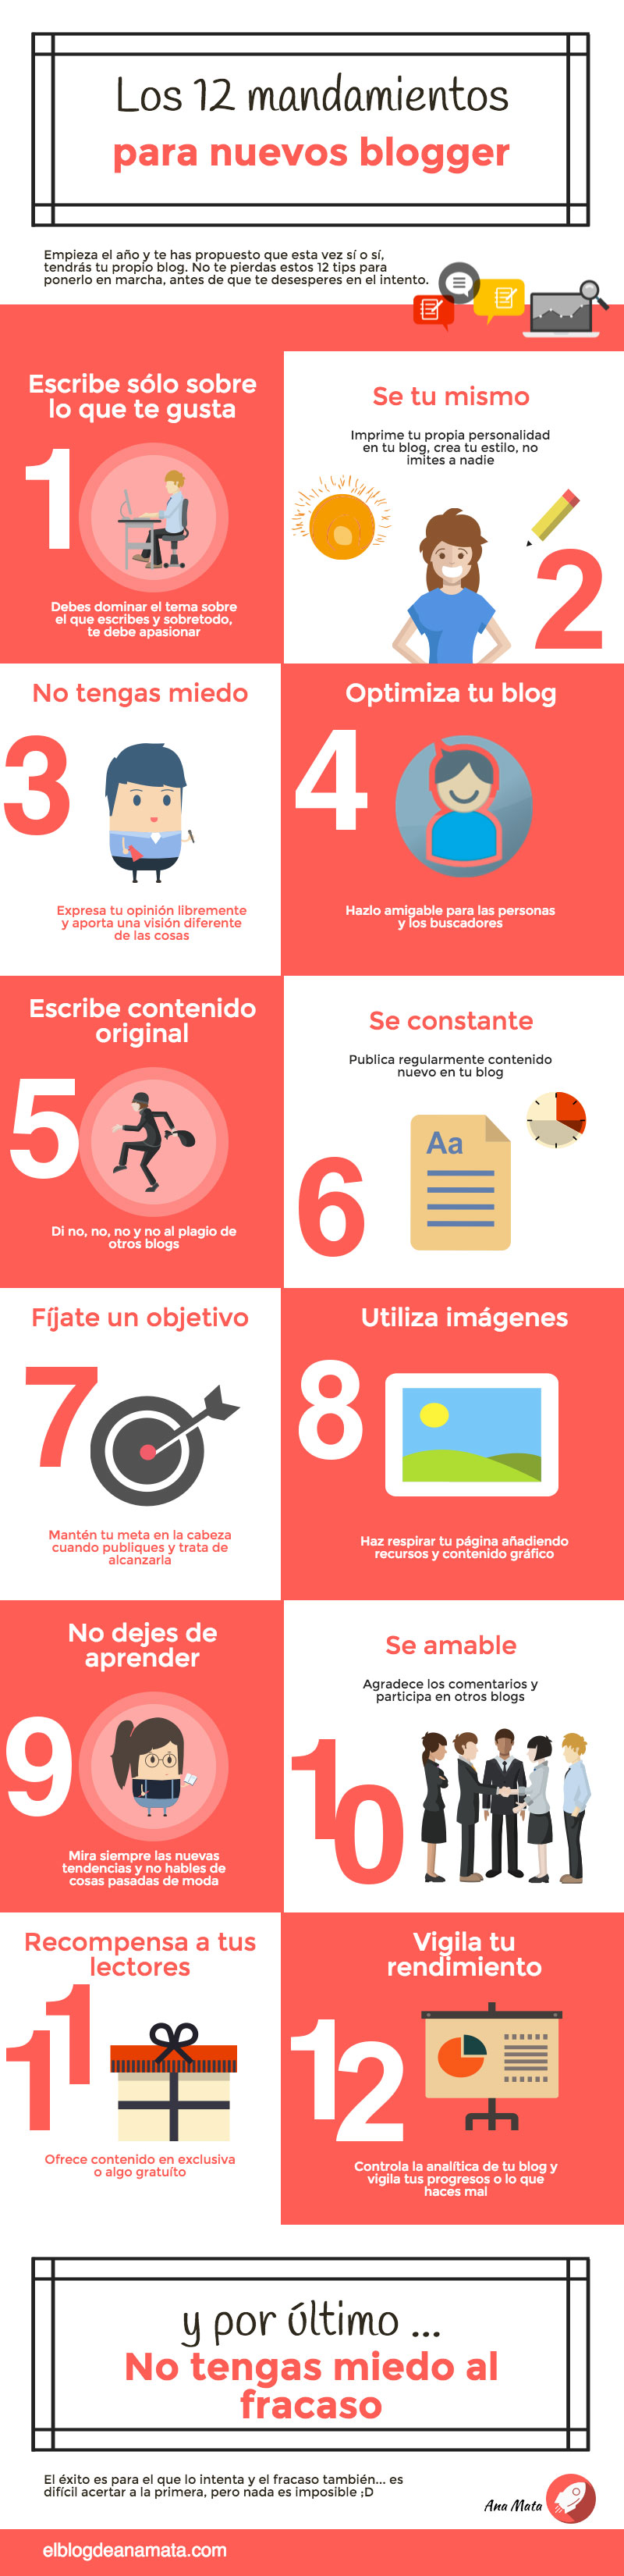 Tips para nuevos bloggers - #INFOGRAFÍA